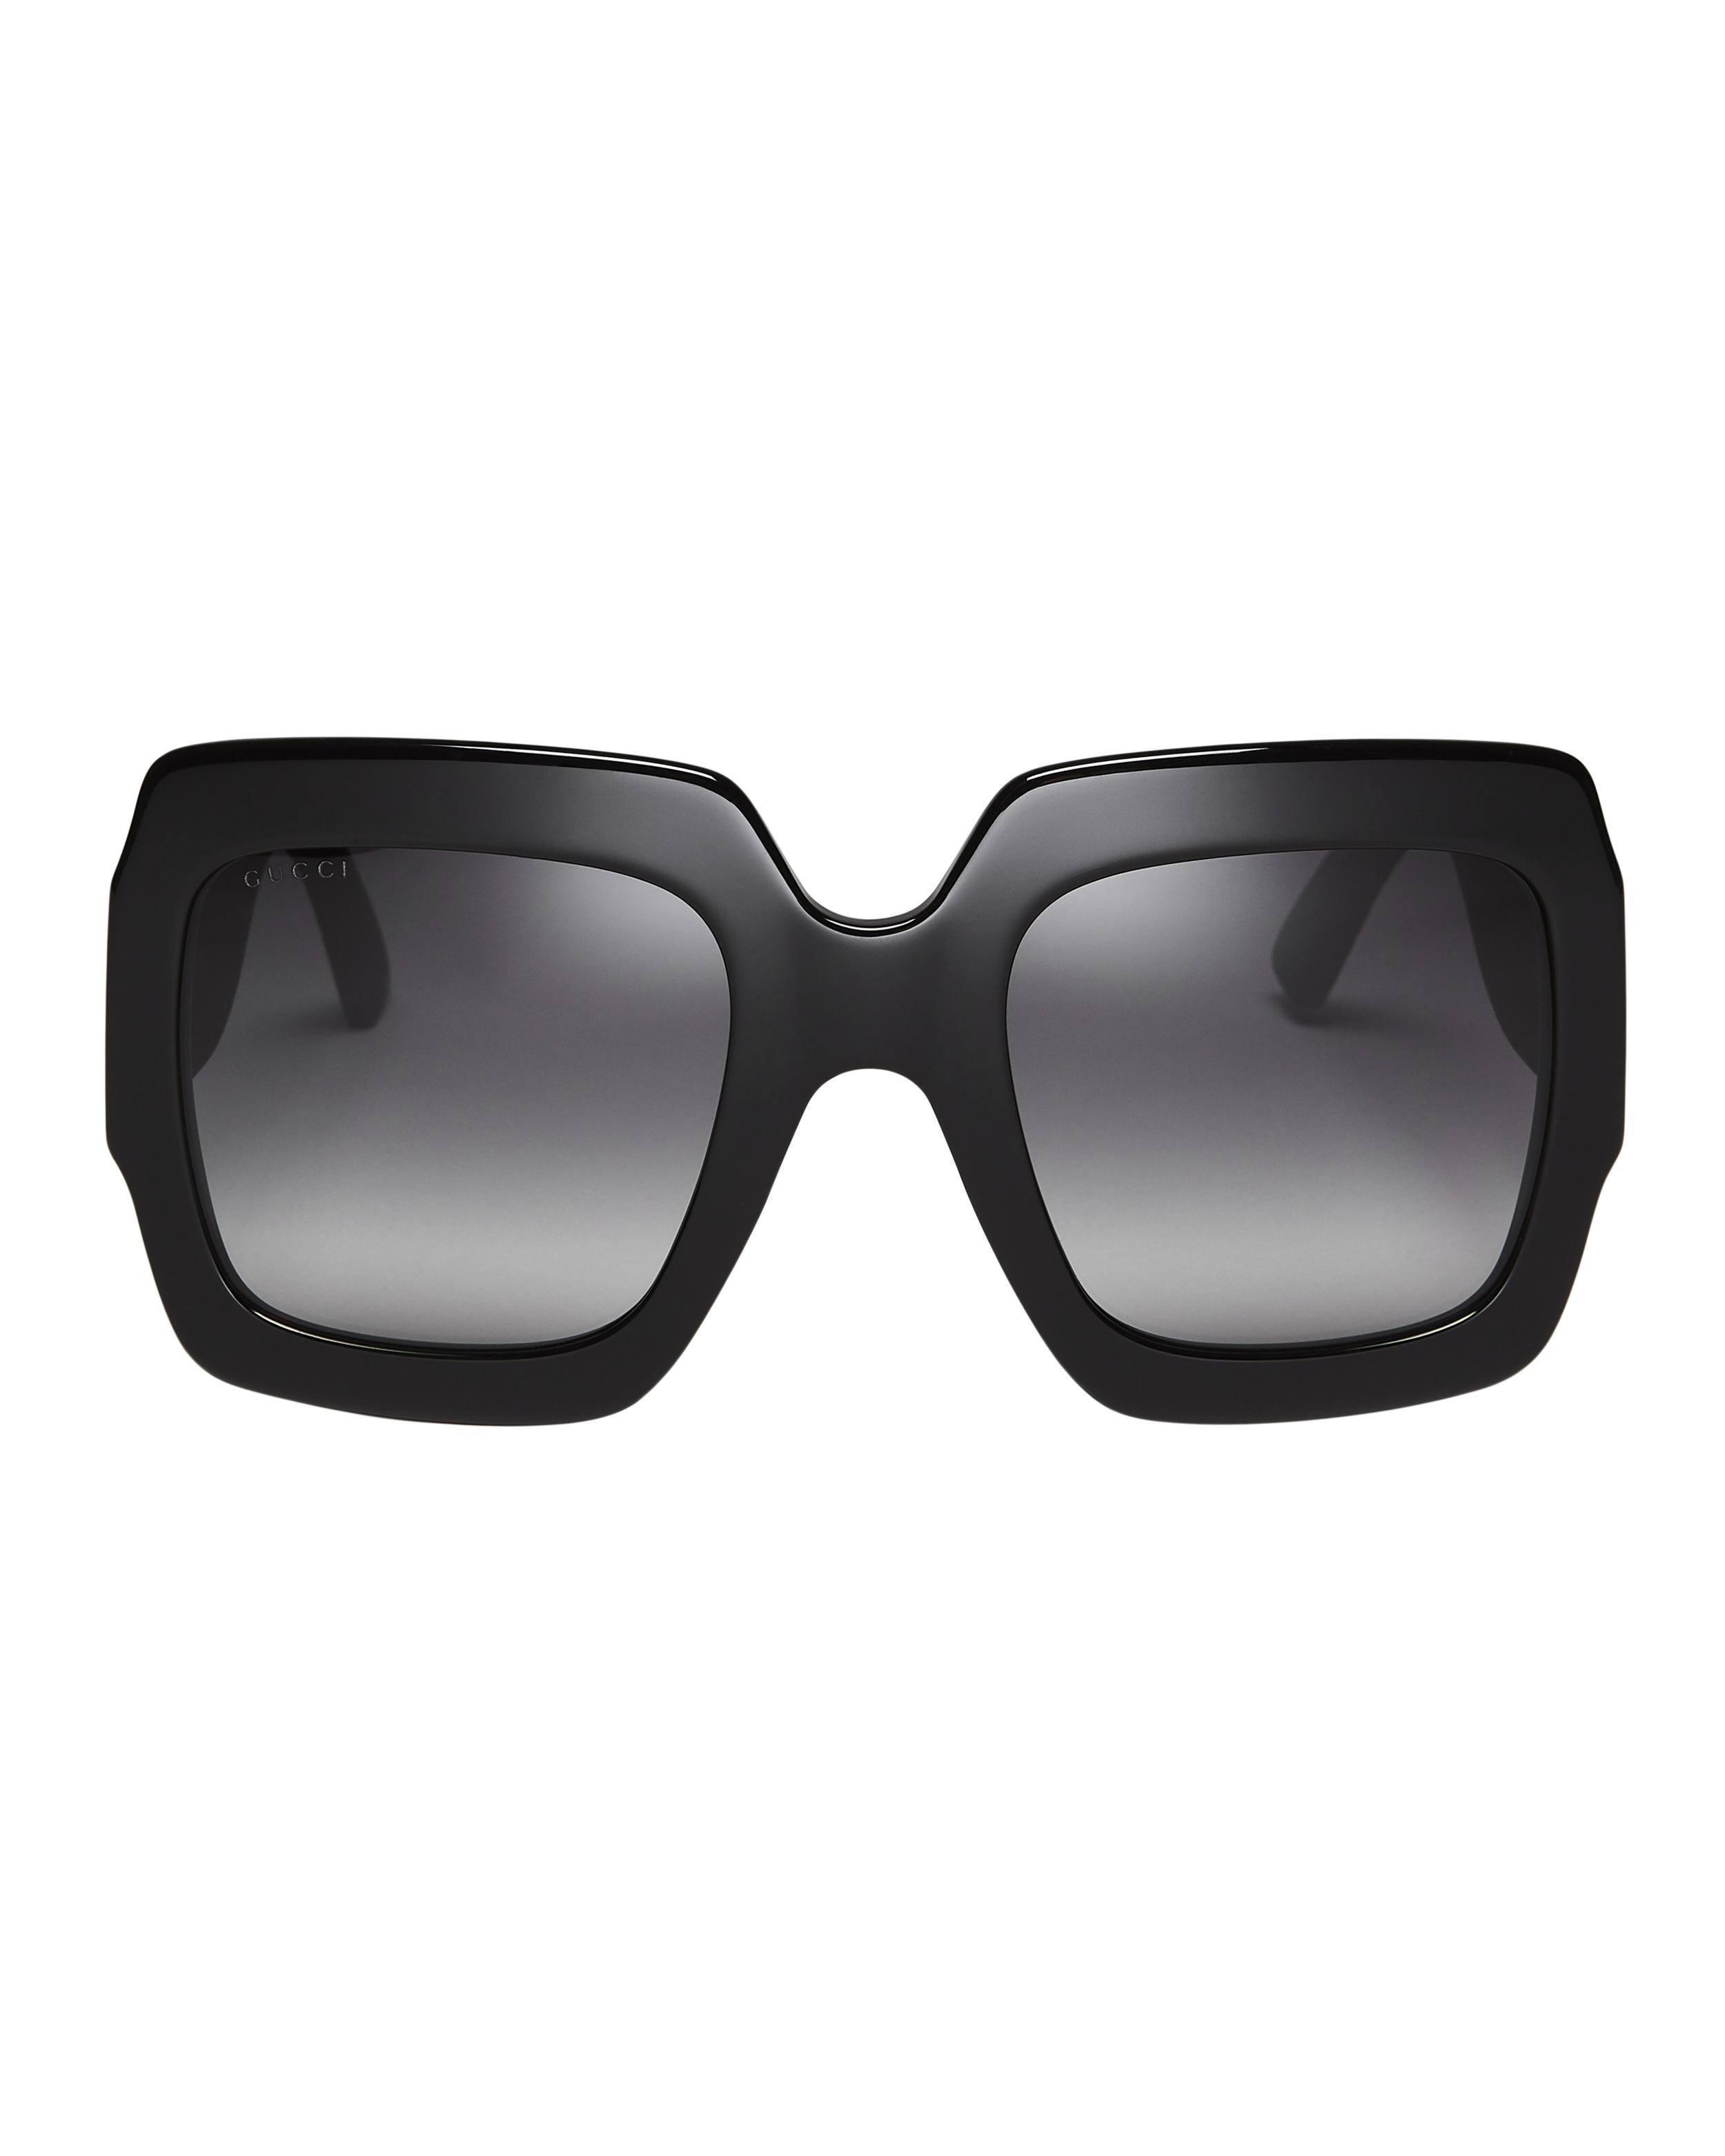 177d523c6a Gucci - Black Oversized Glitter Square Sunglasses - Lyst. View fullscreen